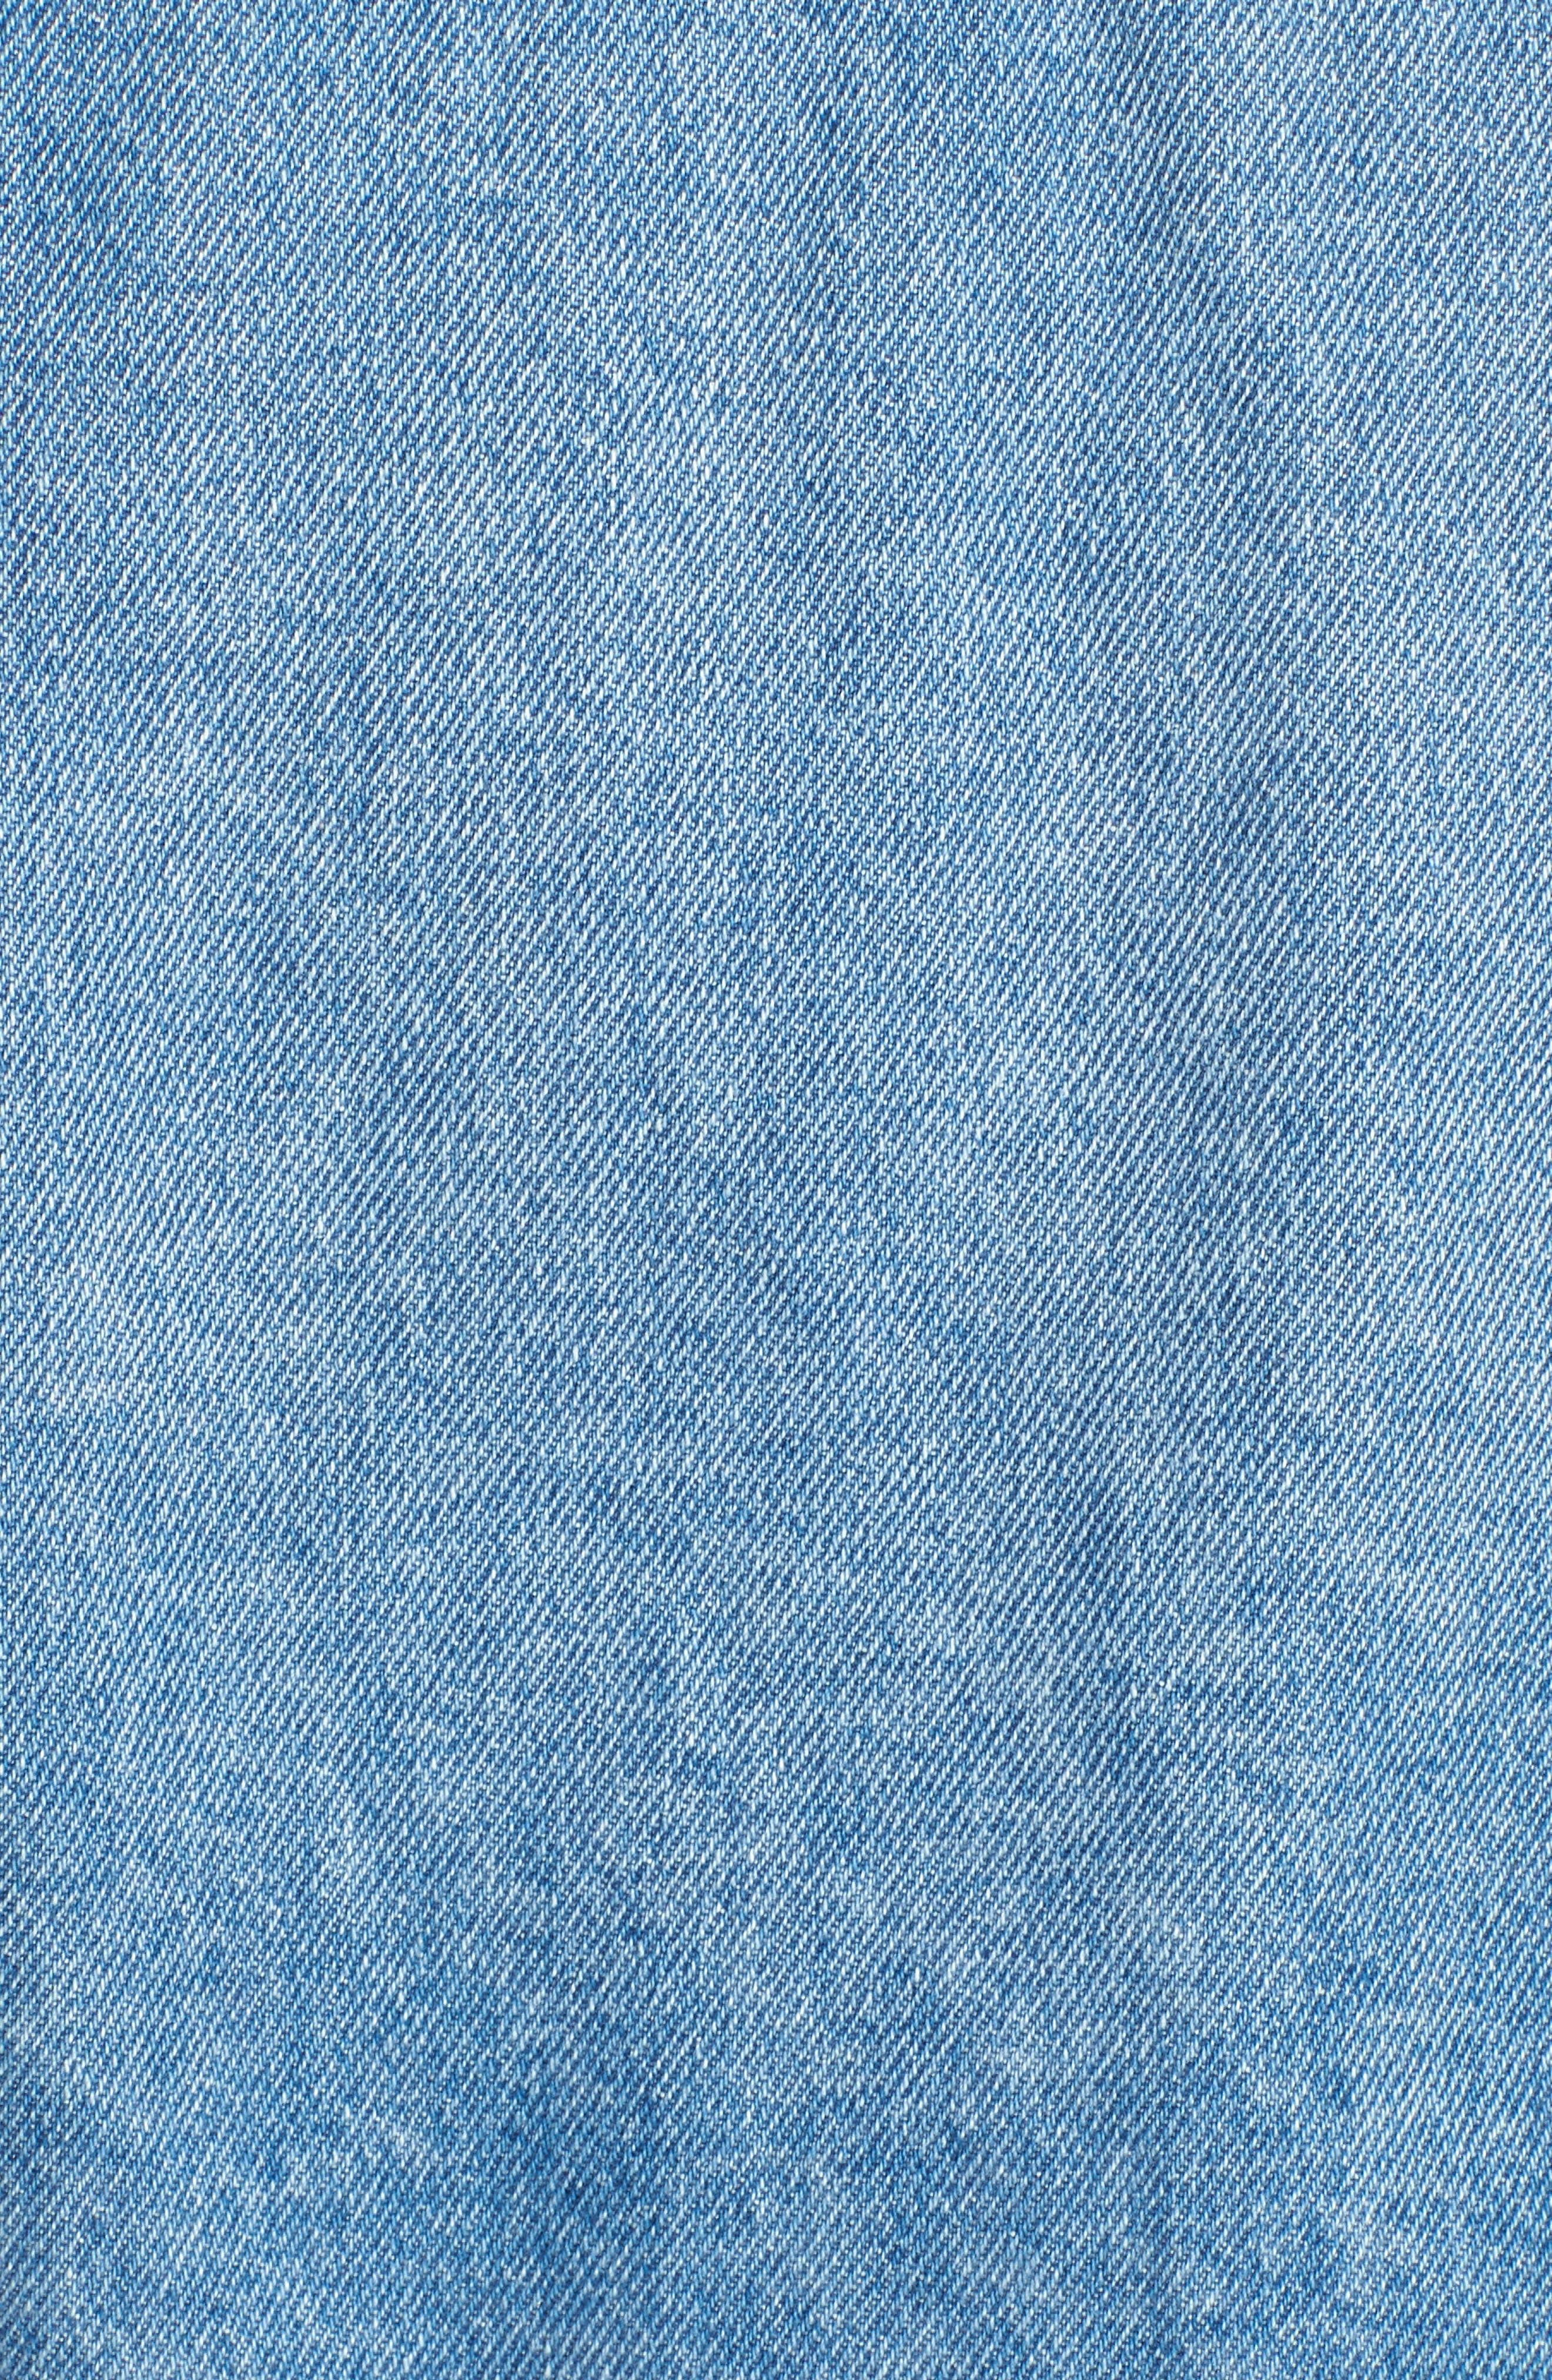 Denim Trucker Jacket,                             Alternate thumbnail 6, color,                             Tommy Jeans Light Blue Rigid